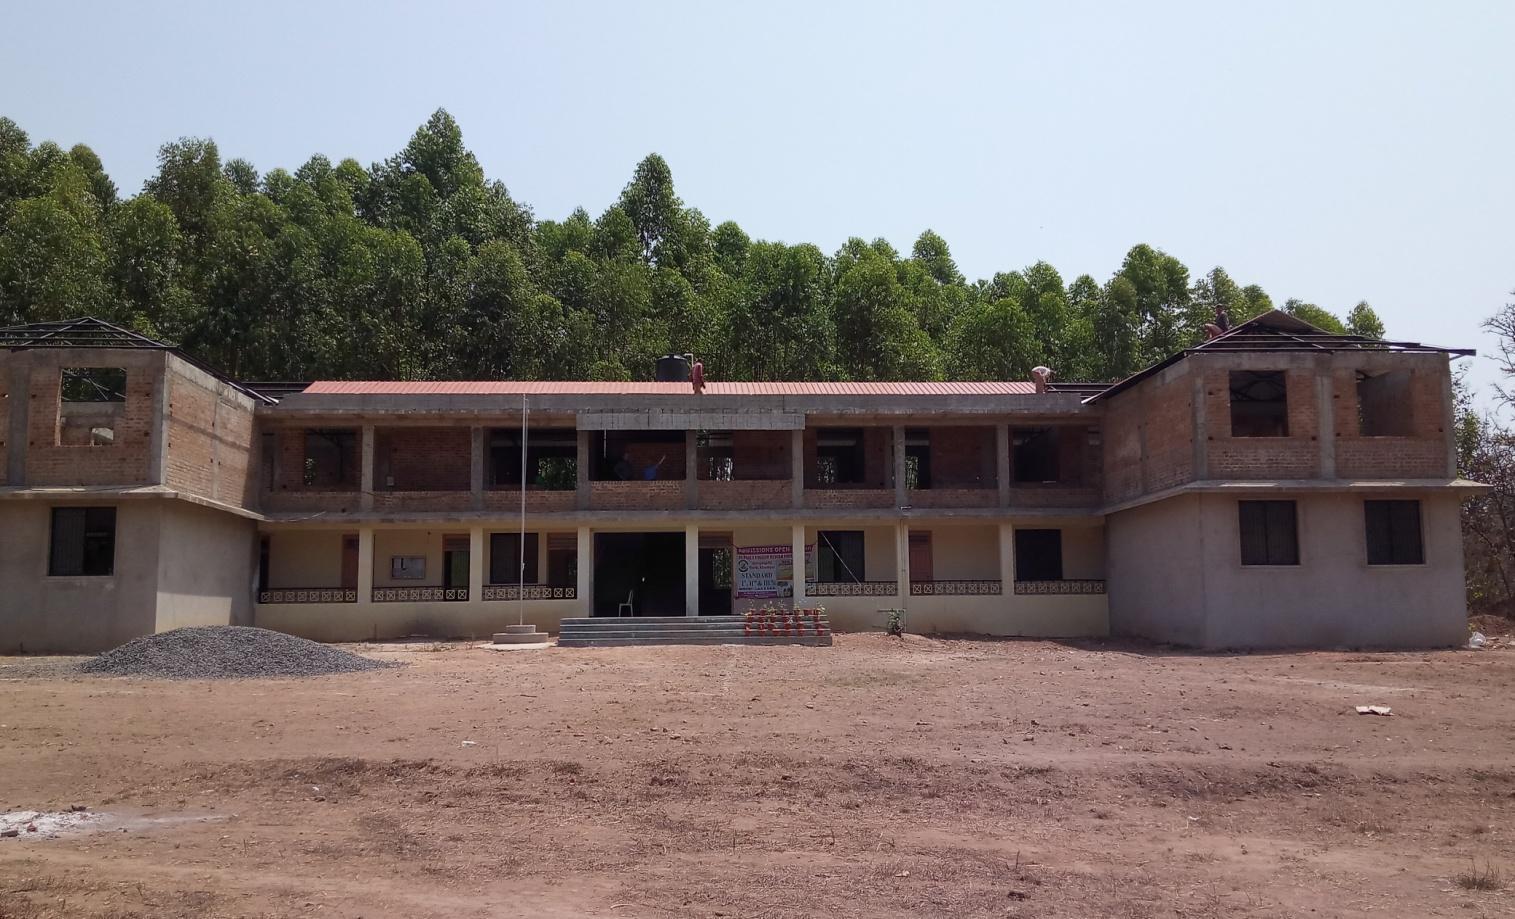 Scuola media in lingua inglese a Sangargalli